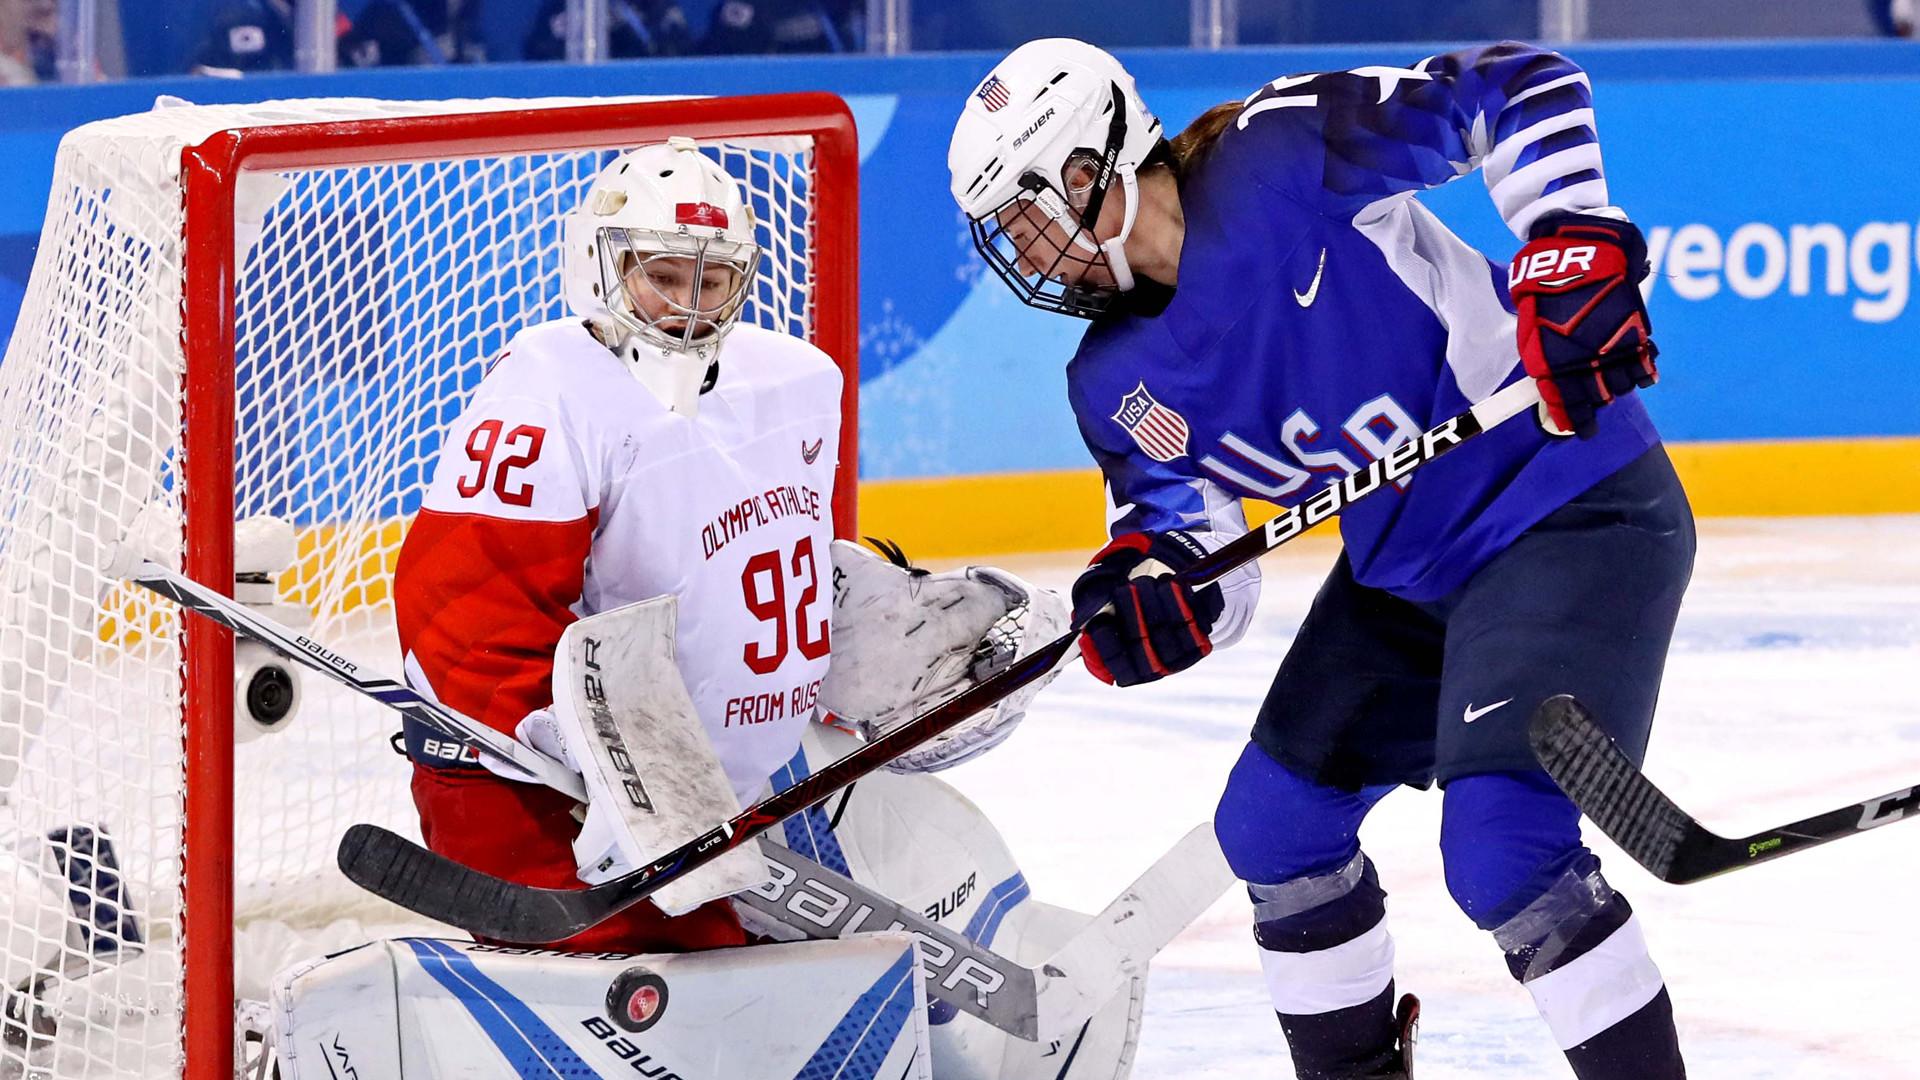 Res: 1920x1080, 2018 Olympic Hockey Results: US women shut out Russia   NBC Sports  Washington